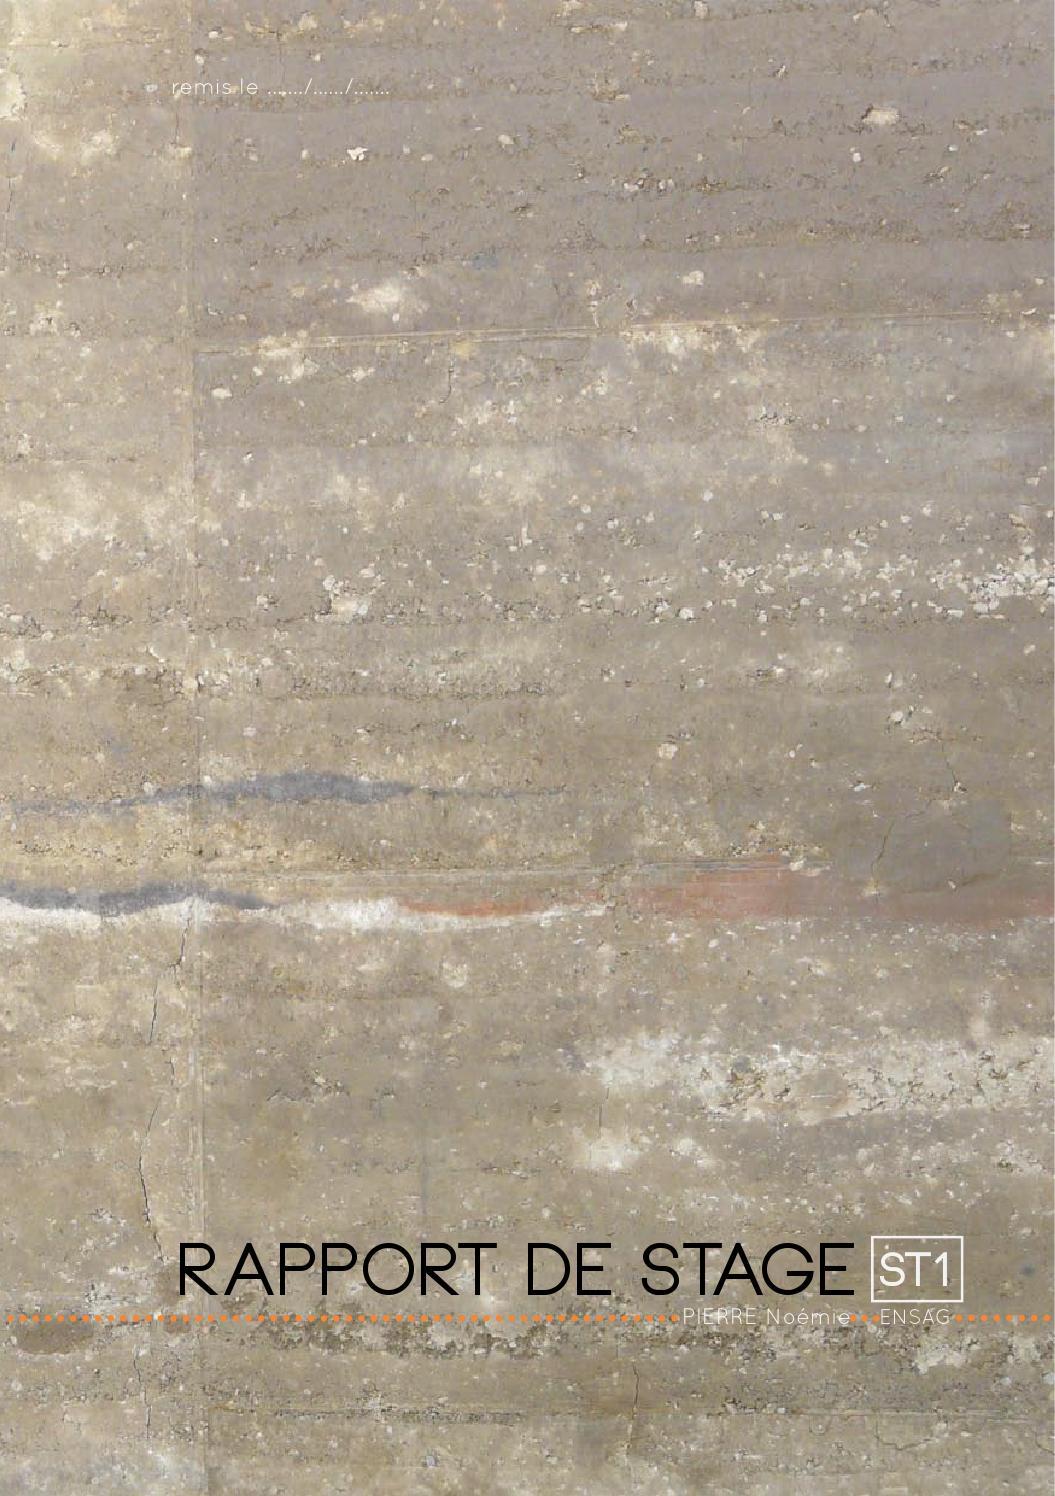 Rapport de stage by no mie issuu - Rapport de stage en cuisine ...